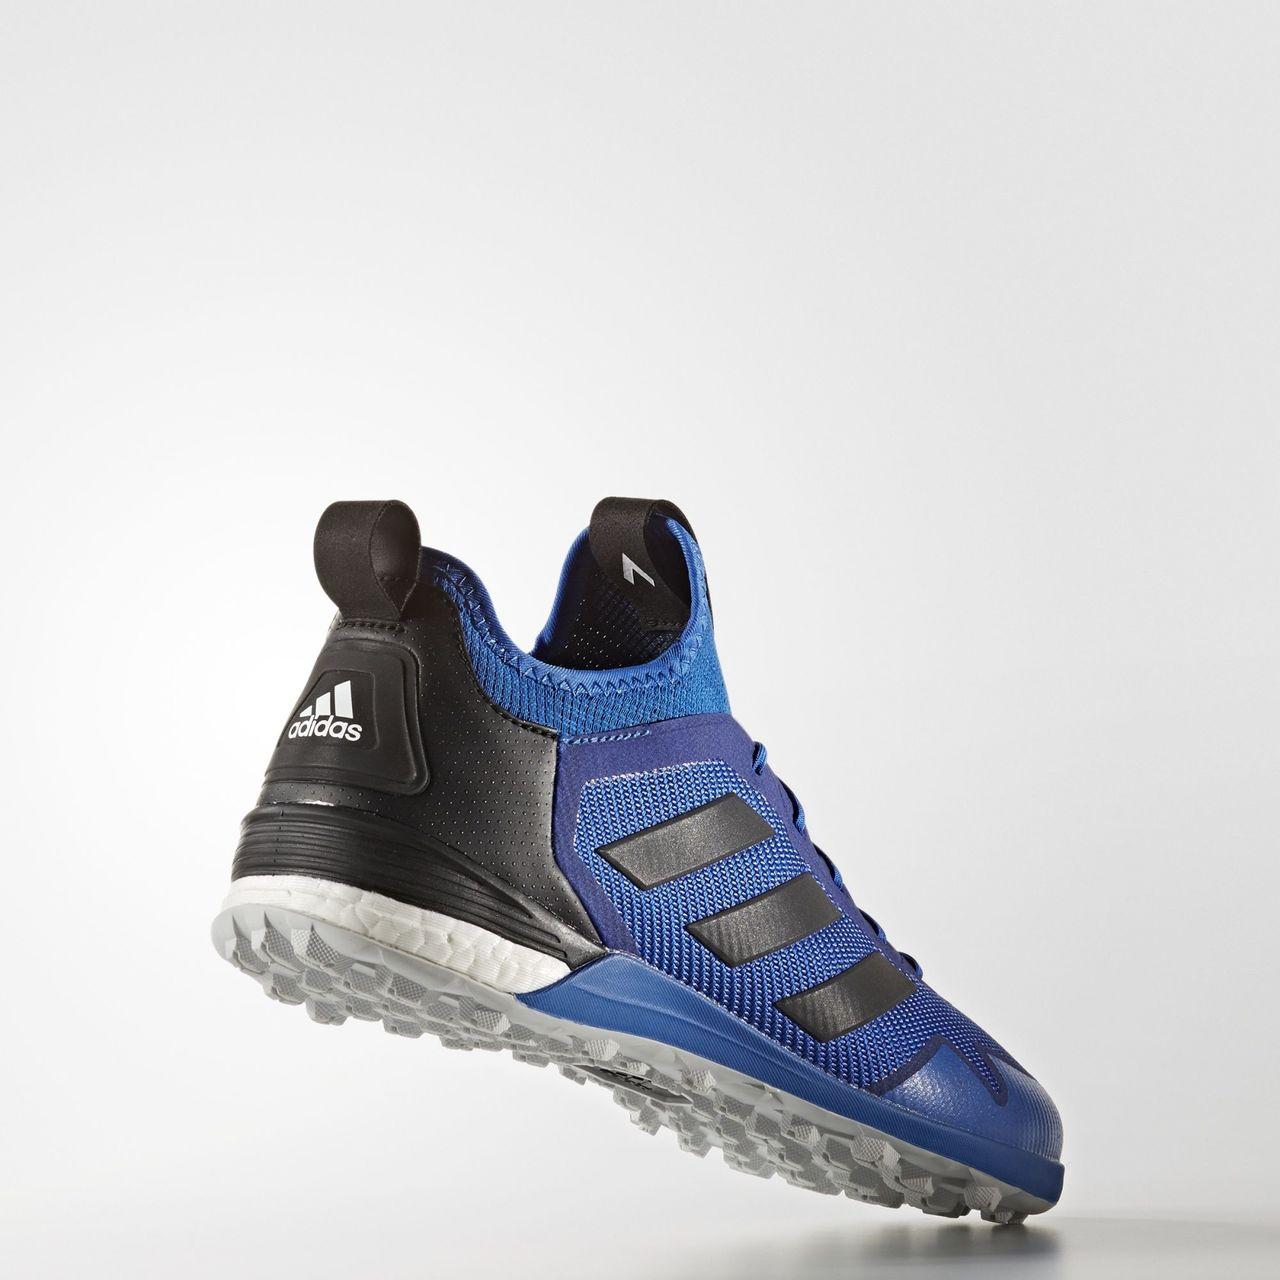 adidas ace tango 17 1 turf boot blue core black. Black Bedroom Furniture Sets. Home Design Ideas